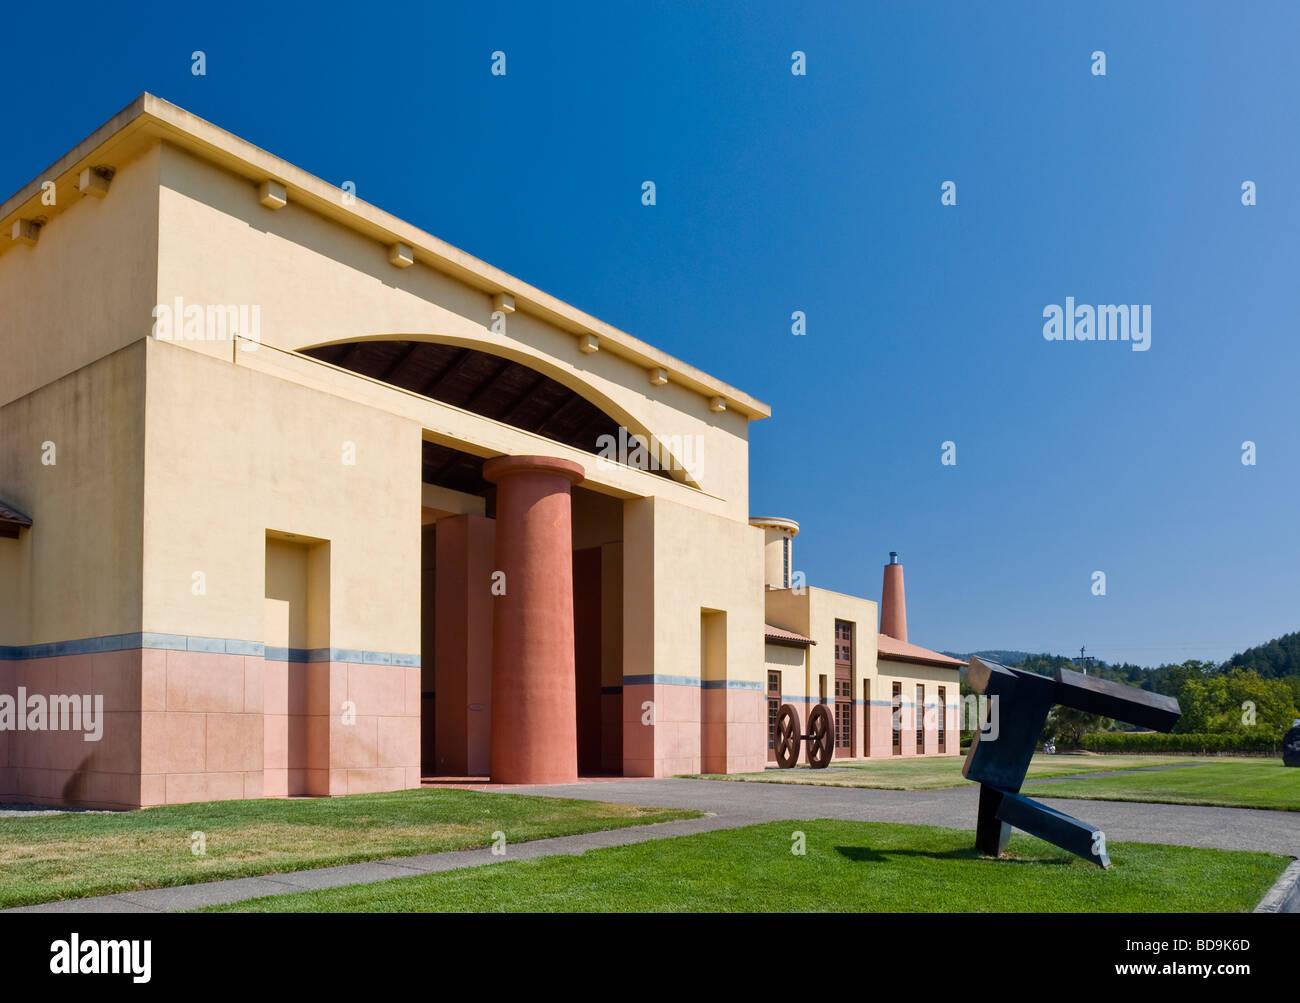 Clos Pegase Weingut, Calistoga, Napa Valley, Kalifornien, Michael Graves, Architekt. Stockbild